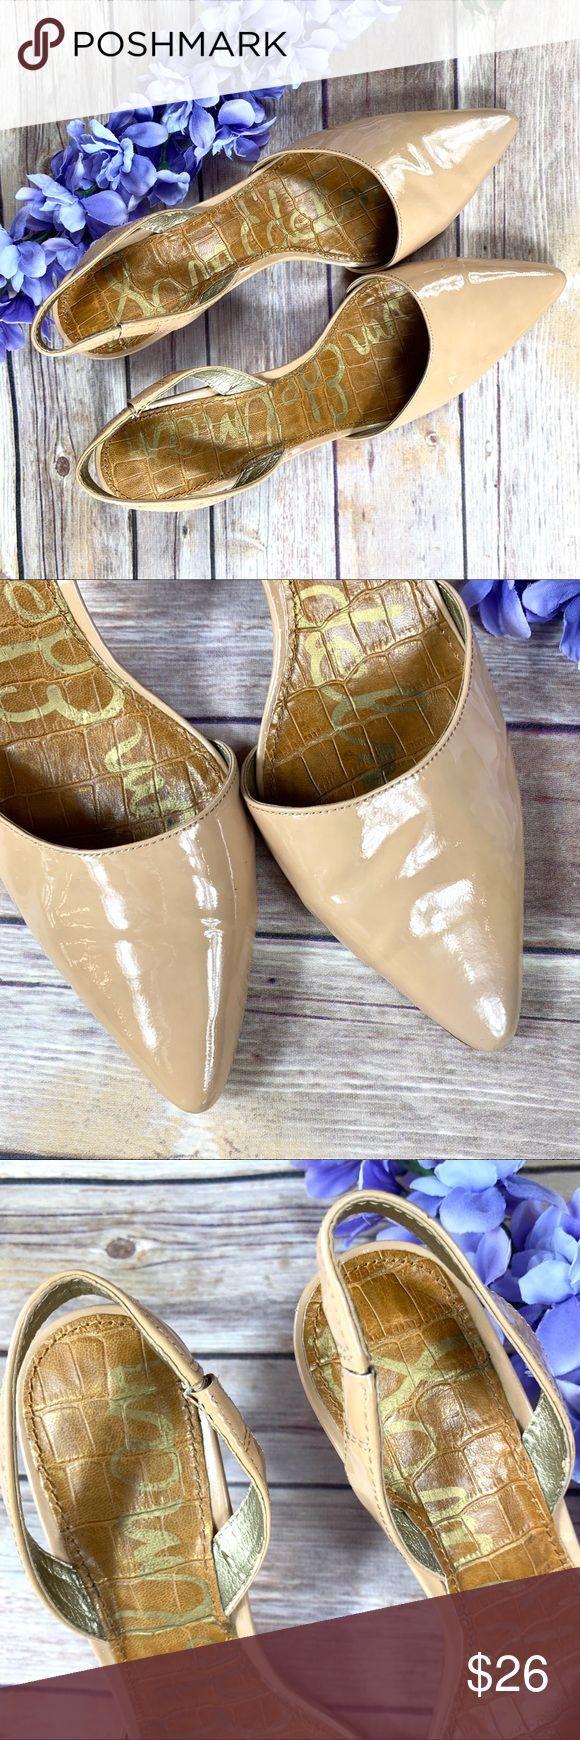 Sam Edelman Tan Patent Leather Slingback Heels 7.5 *Brand: Sam Edelman *Descript…